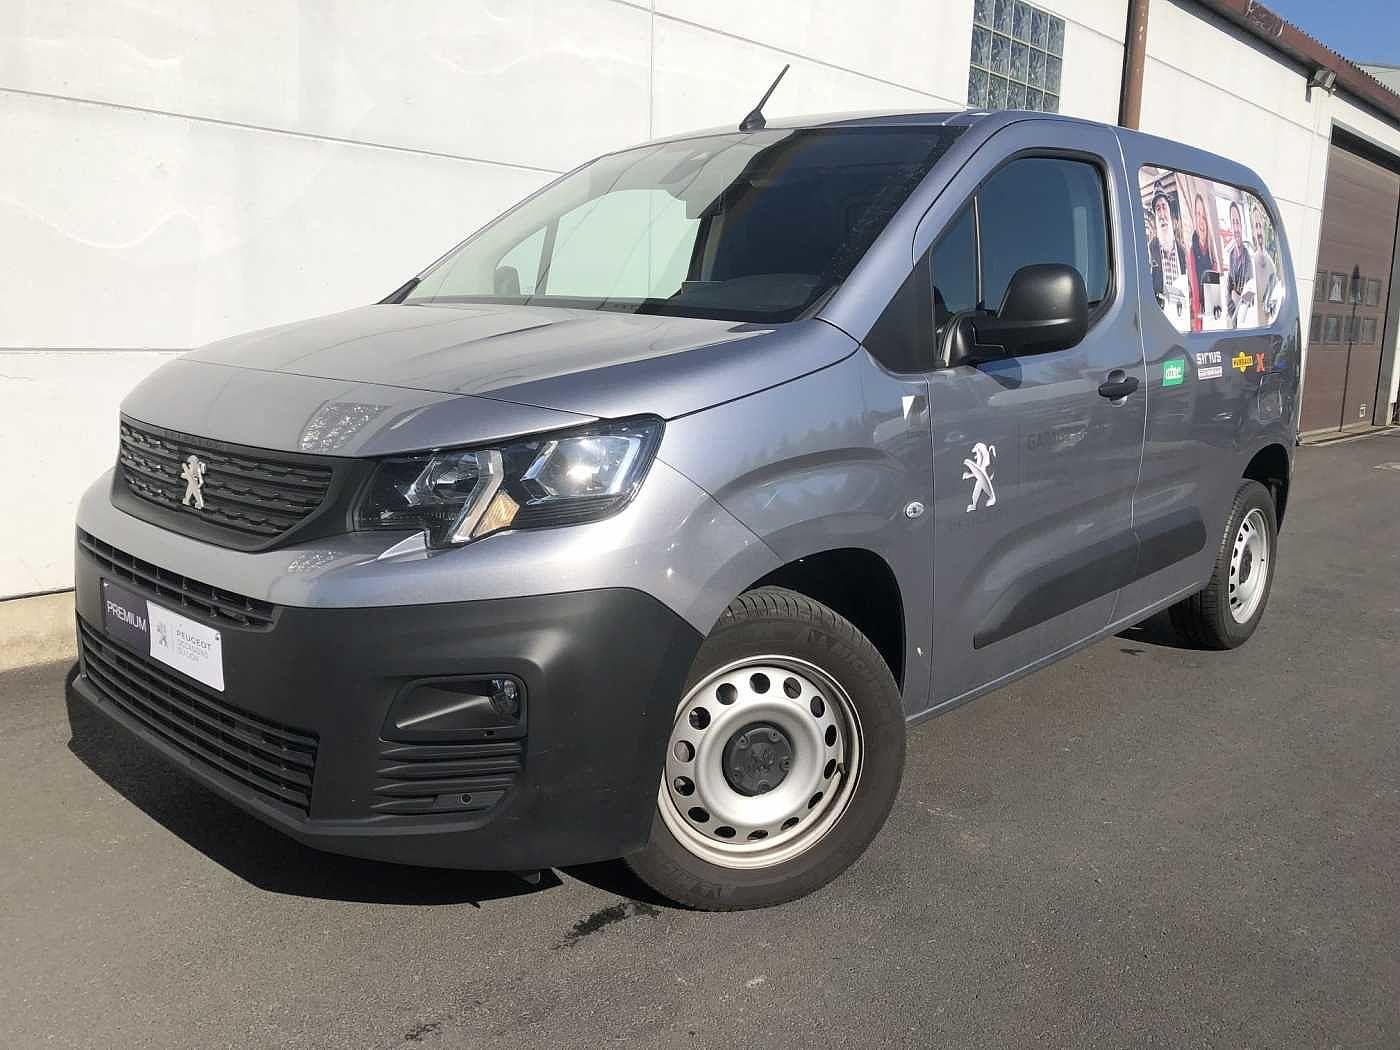 Peugeot 1.6 BlueHDi L1 STD Heavy Premium S&S